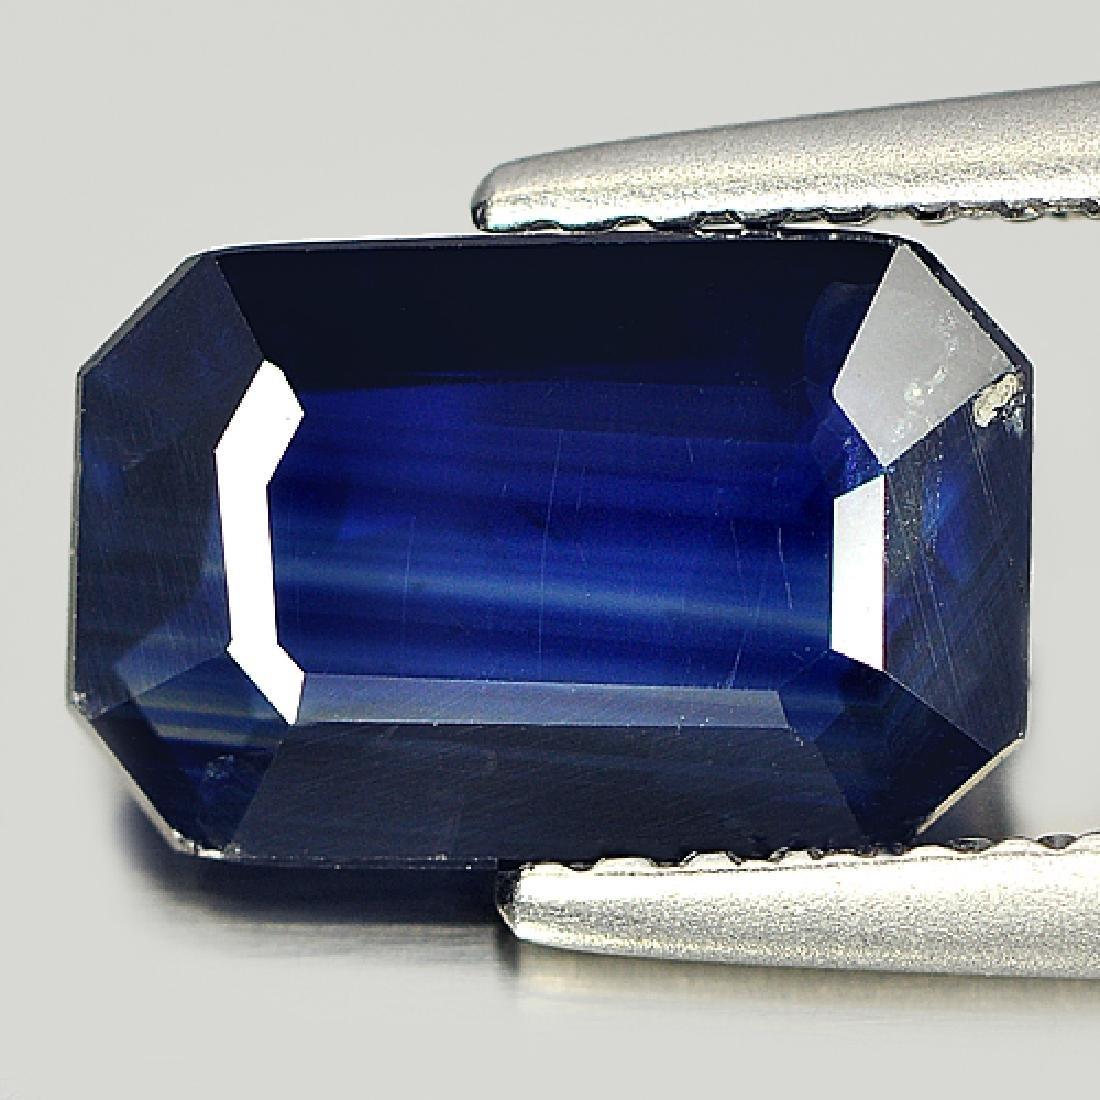 Ceritfied 1.92 Ct. Octagon Shape Natural Blue Sapphire